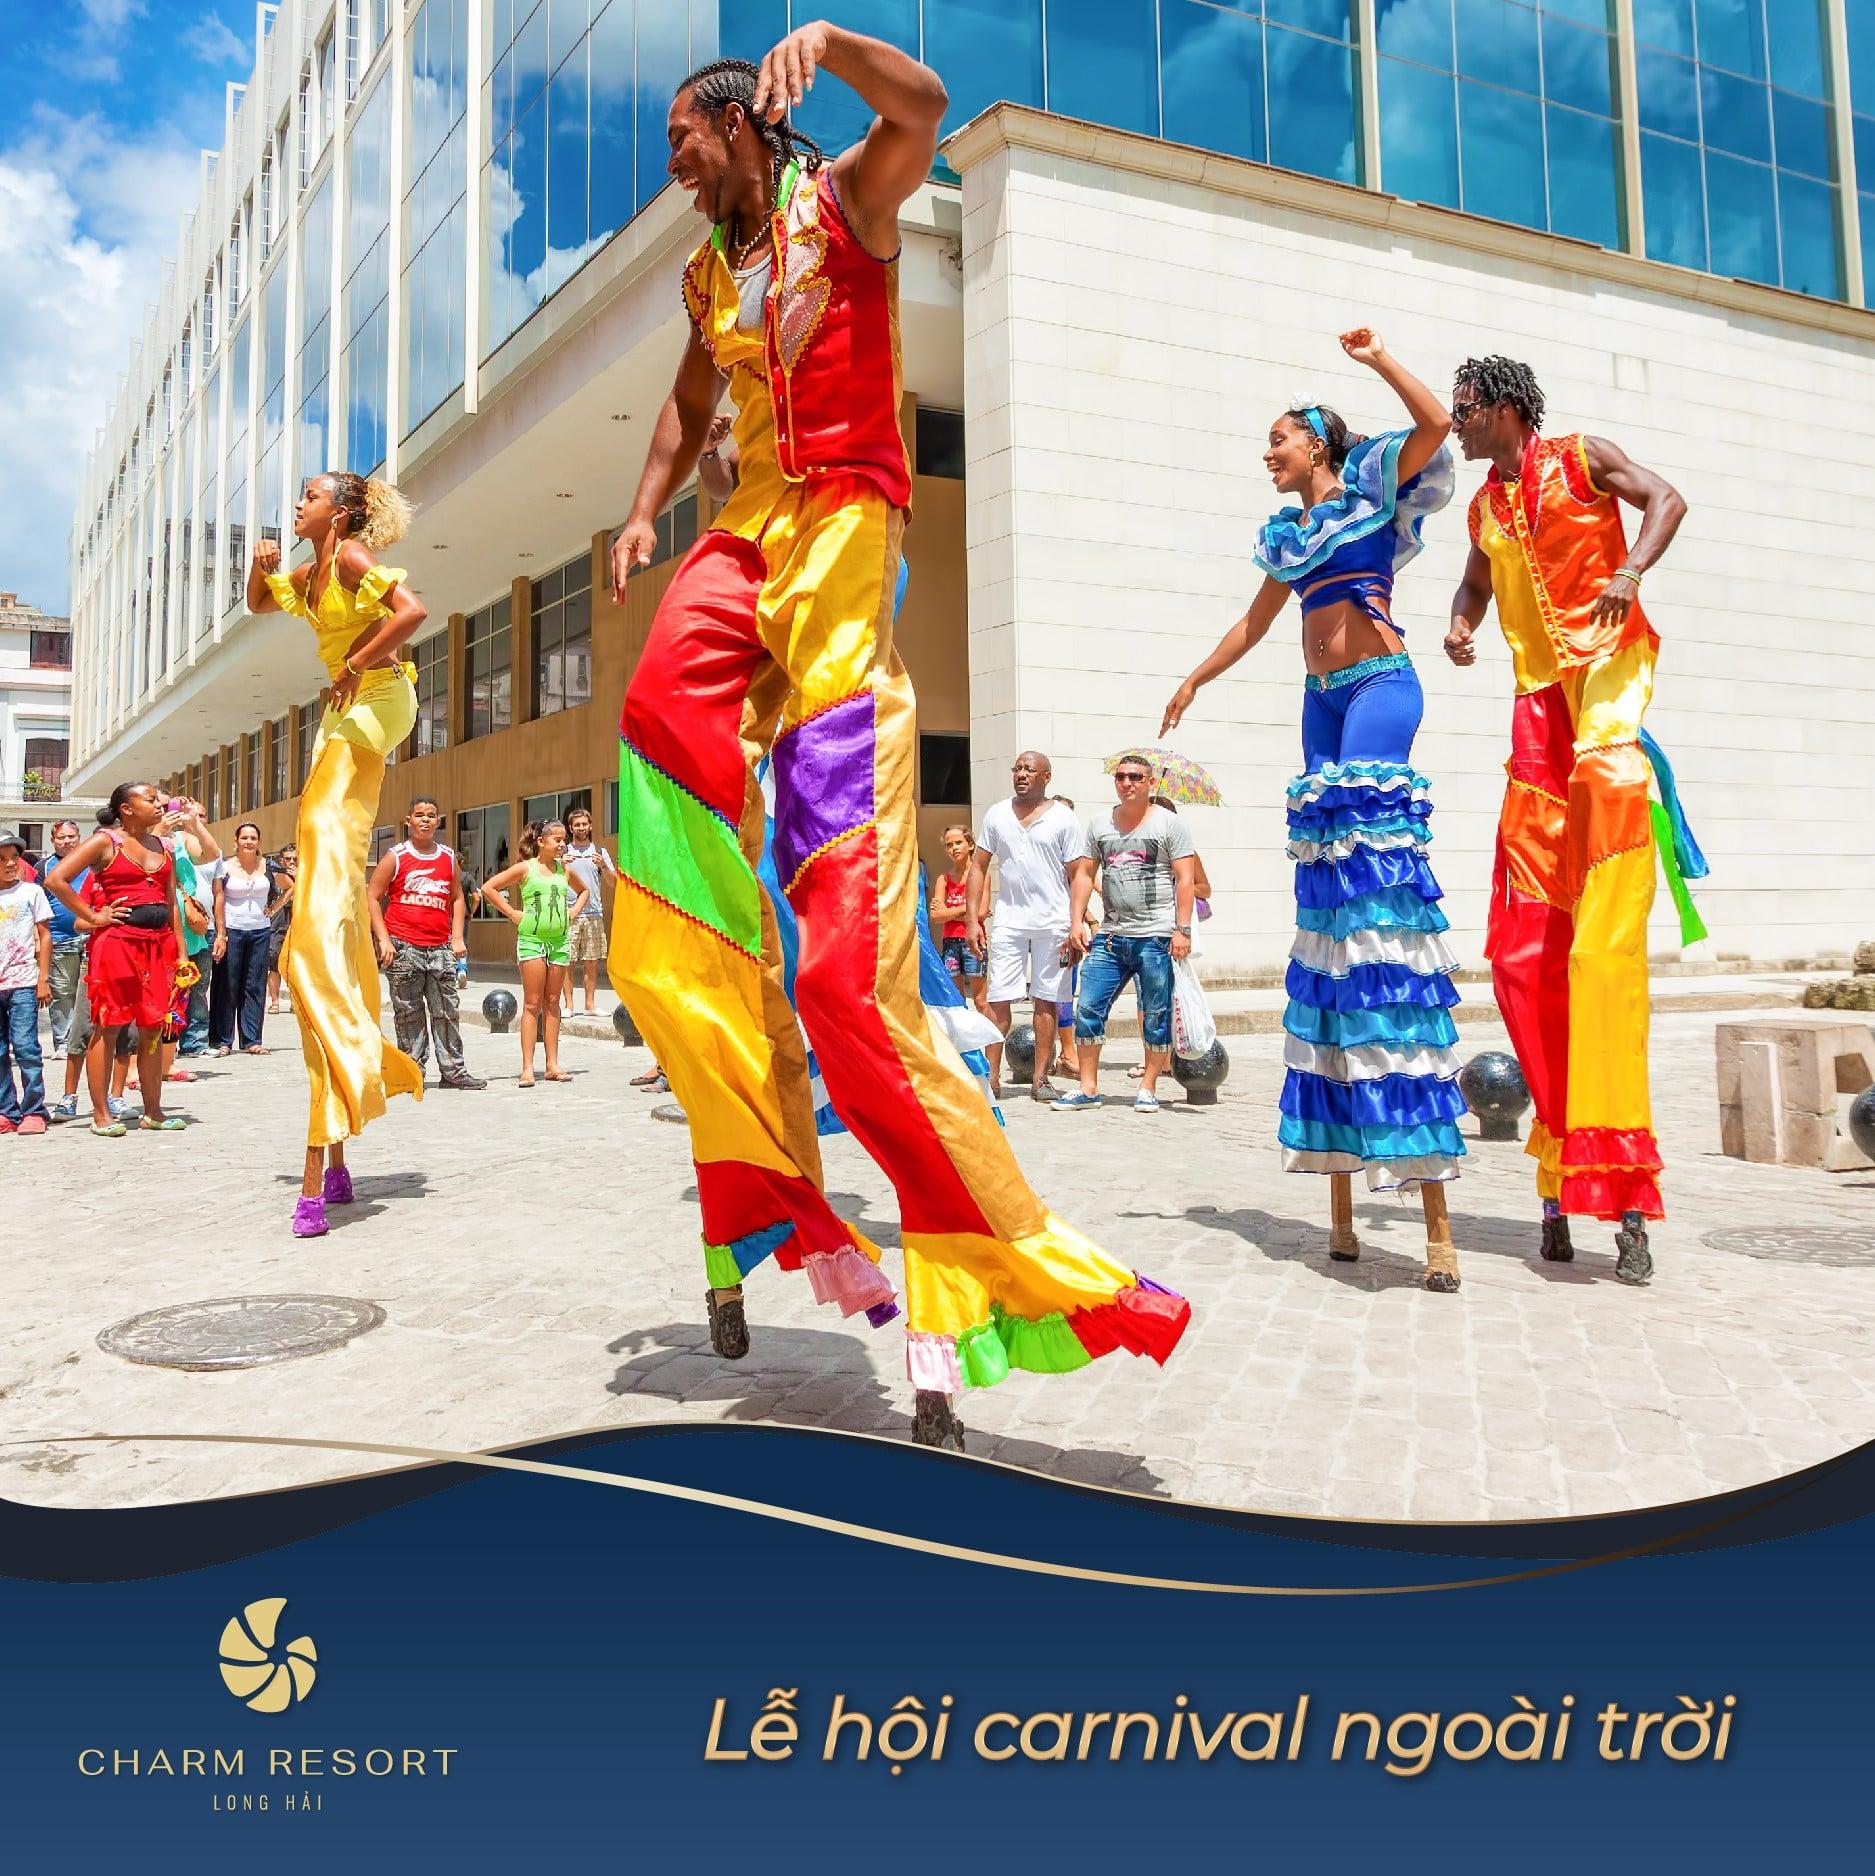 le-hoi-carnival-ngoai-troi-charm-resort-long-hai